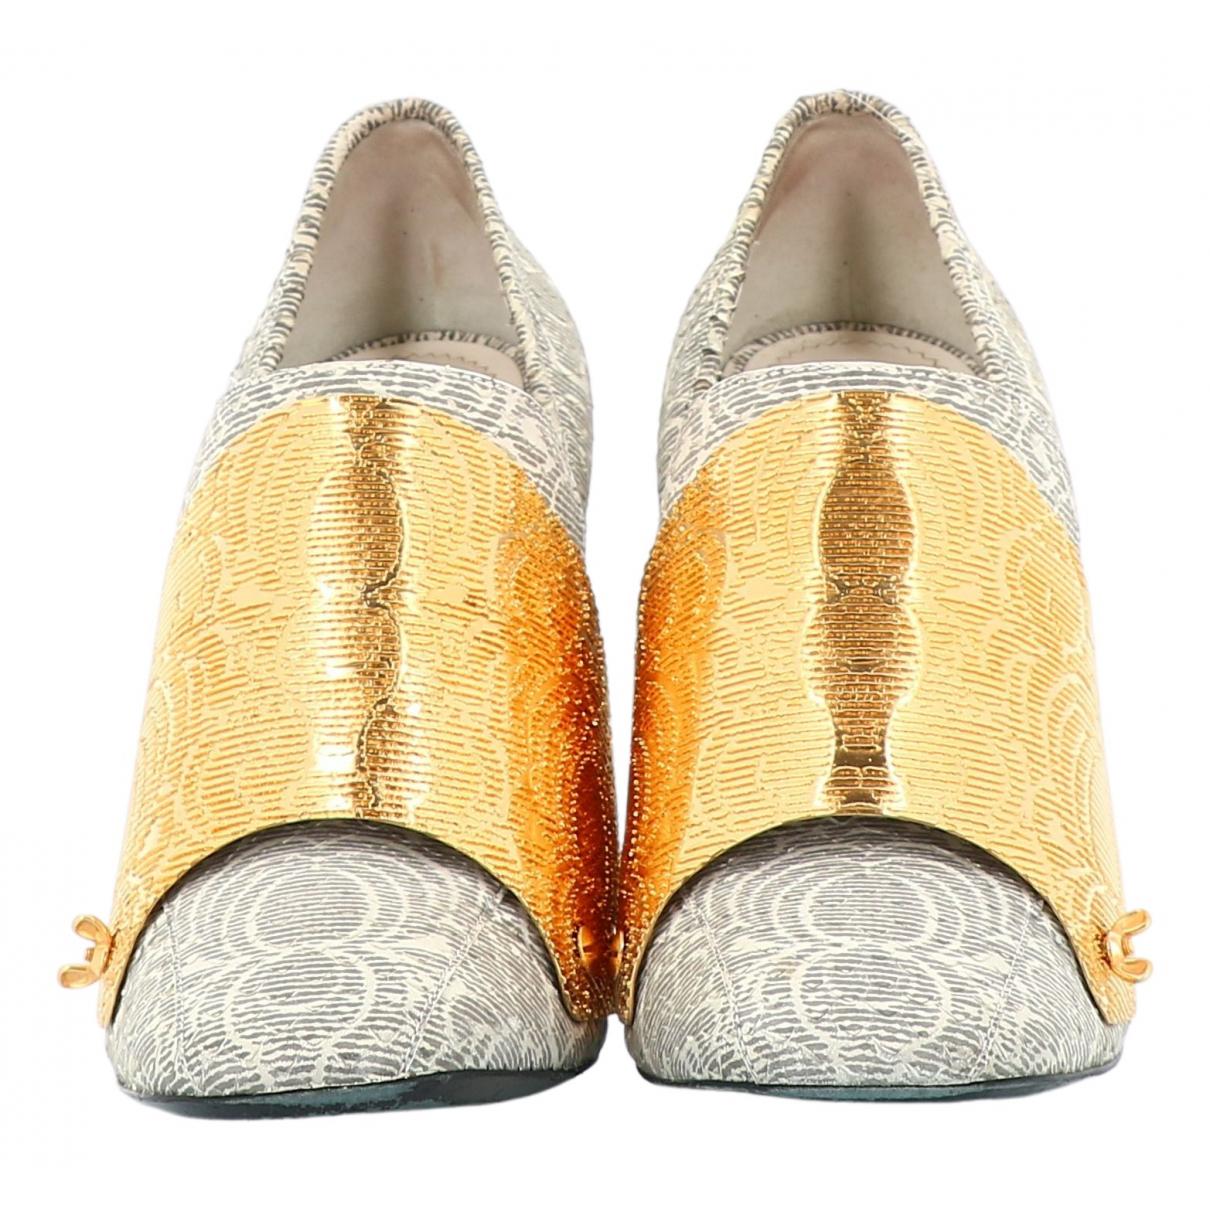 Yves Saint Laurent \N Grey Leather Heels for Women 39.5 EU